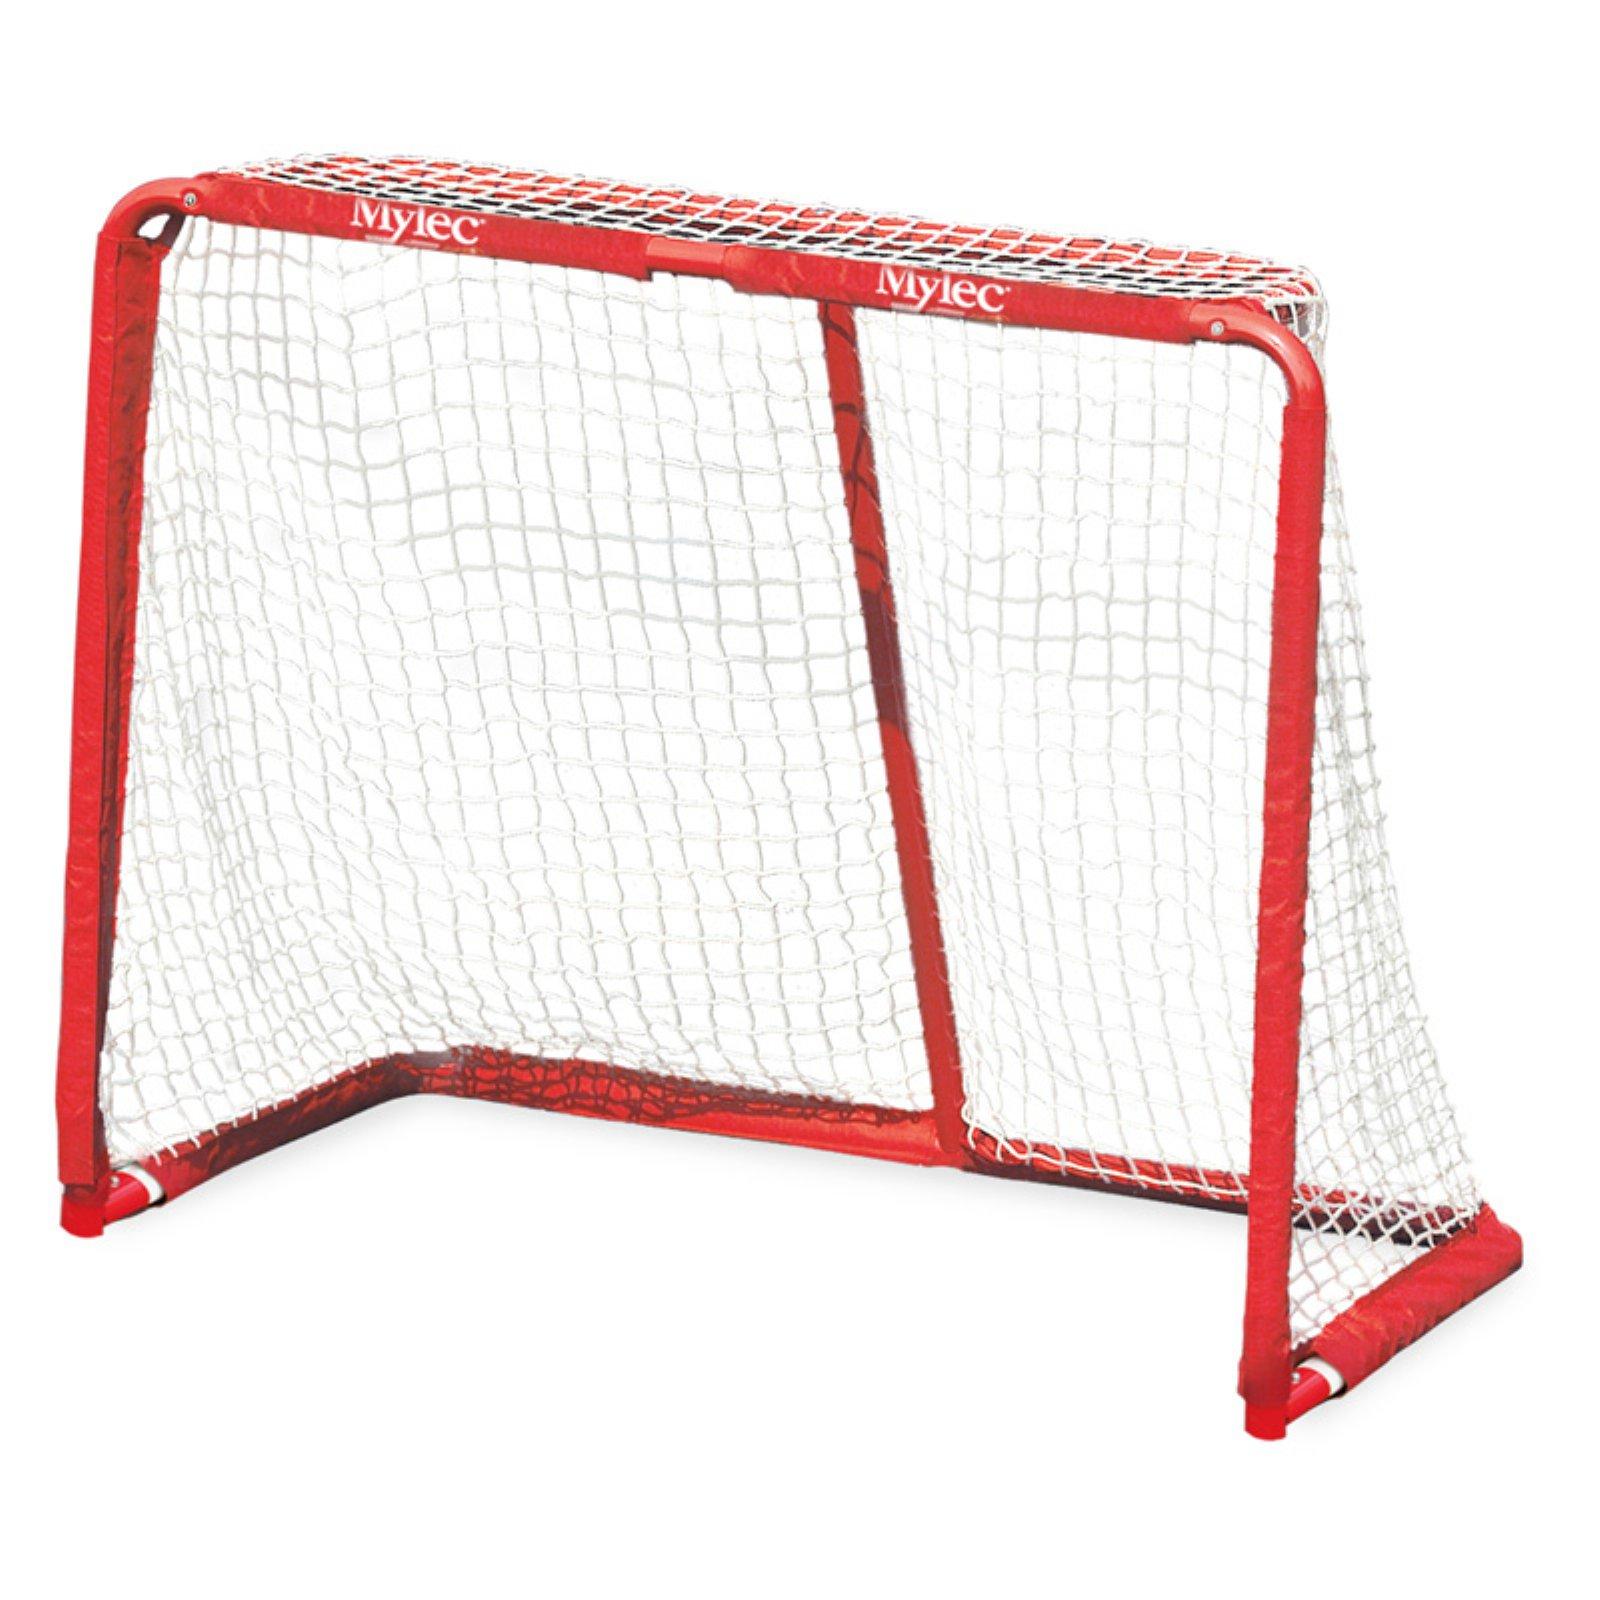 Mylec Pro Style Steel Hockey Goal